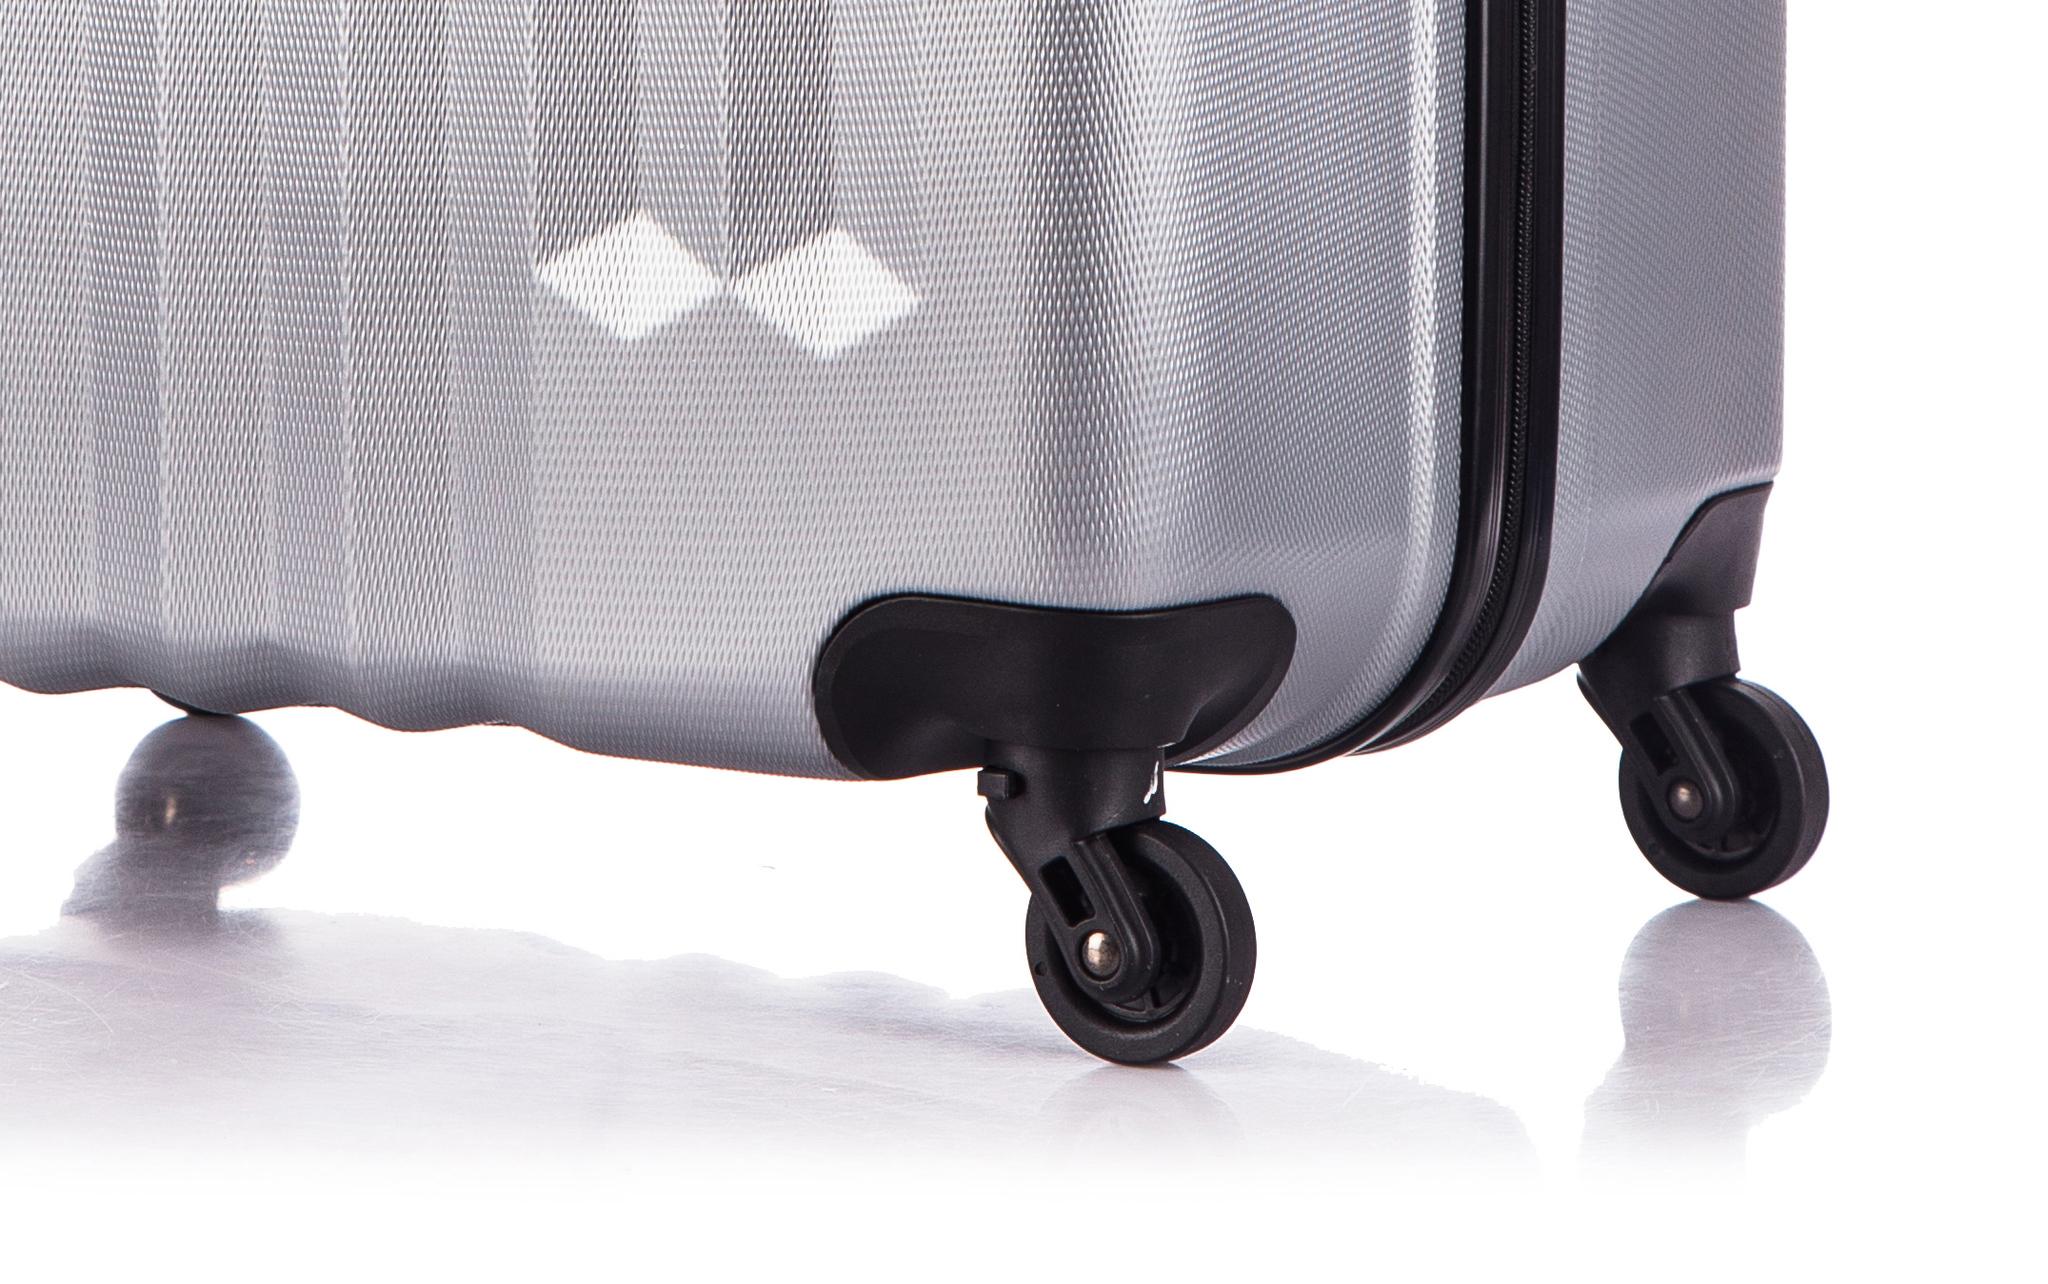 Чемодан со съемными колесами L'case Phuket-24 Серебро (M)